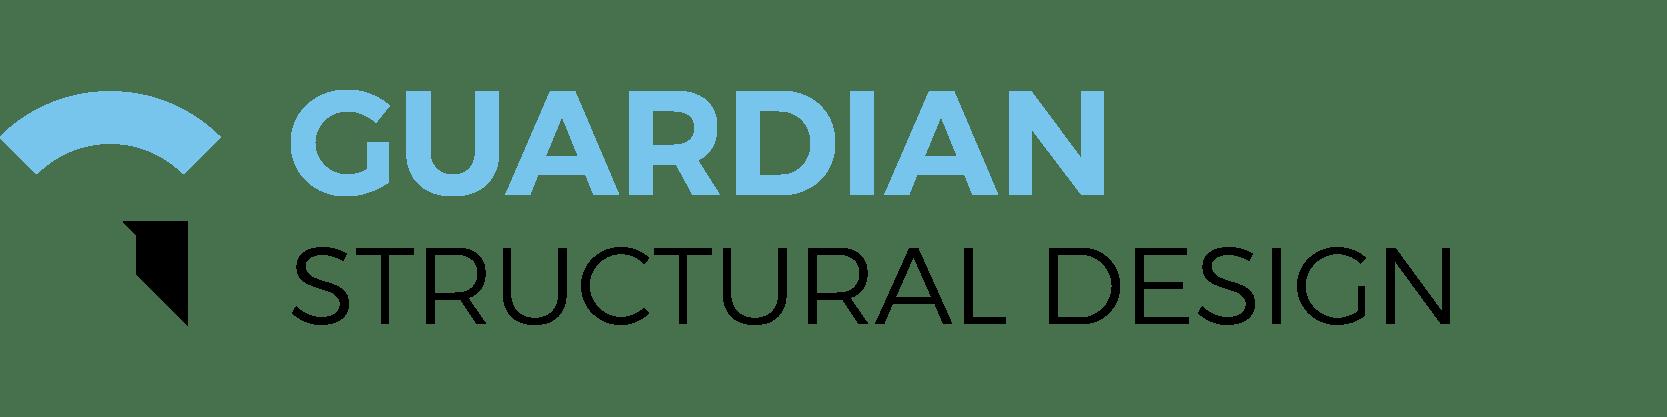 Guardian Structural Design